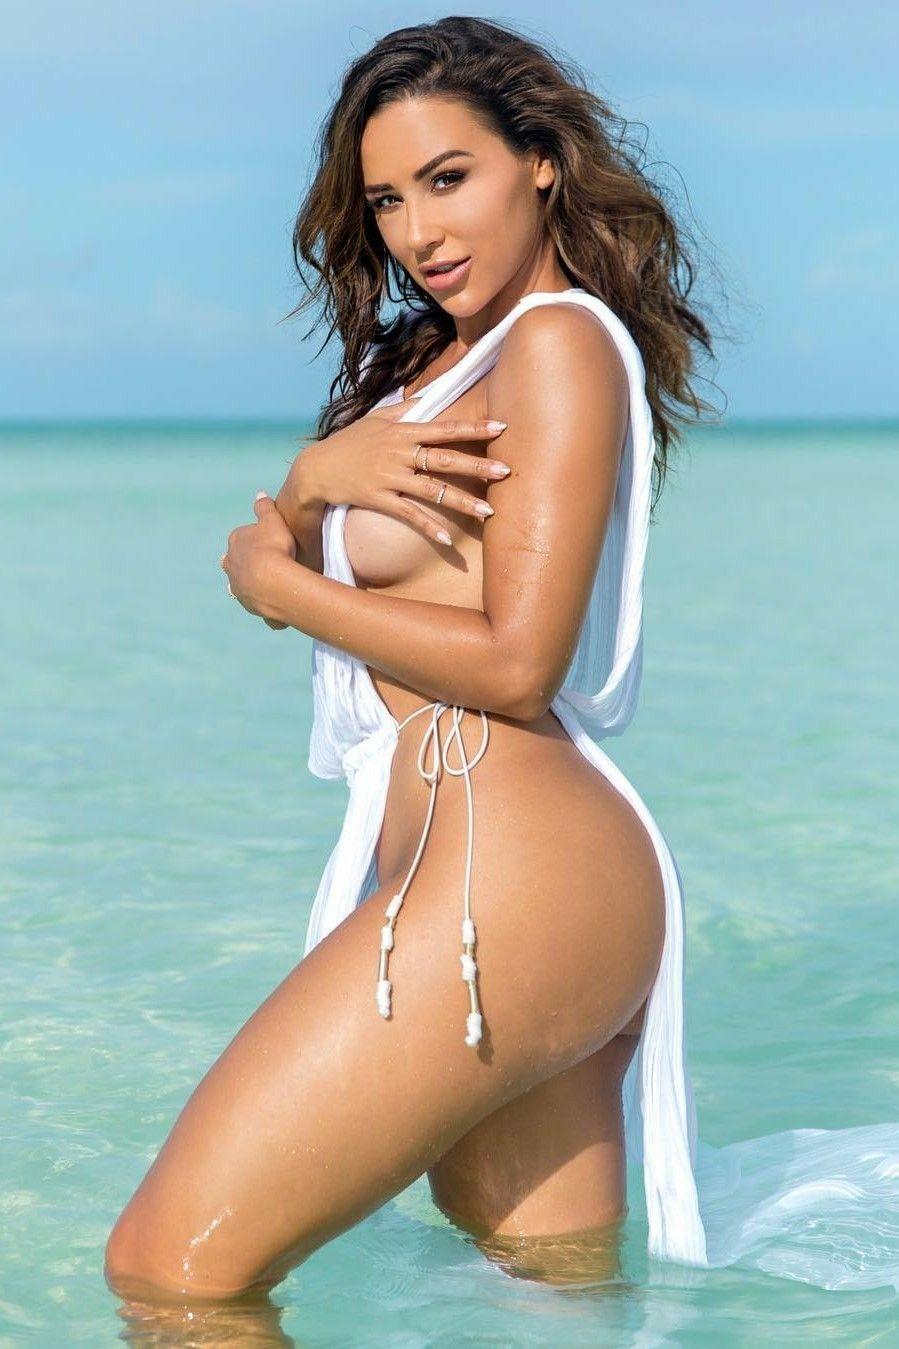 Ana Cheri By Jd Bikini Beauty Ana Cheri